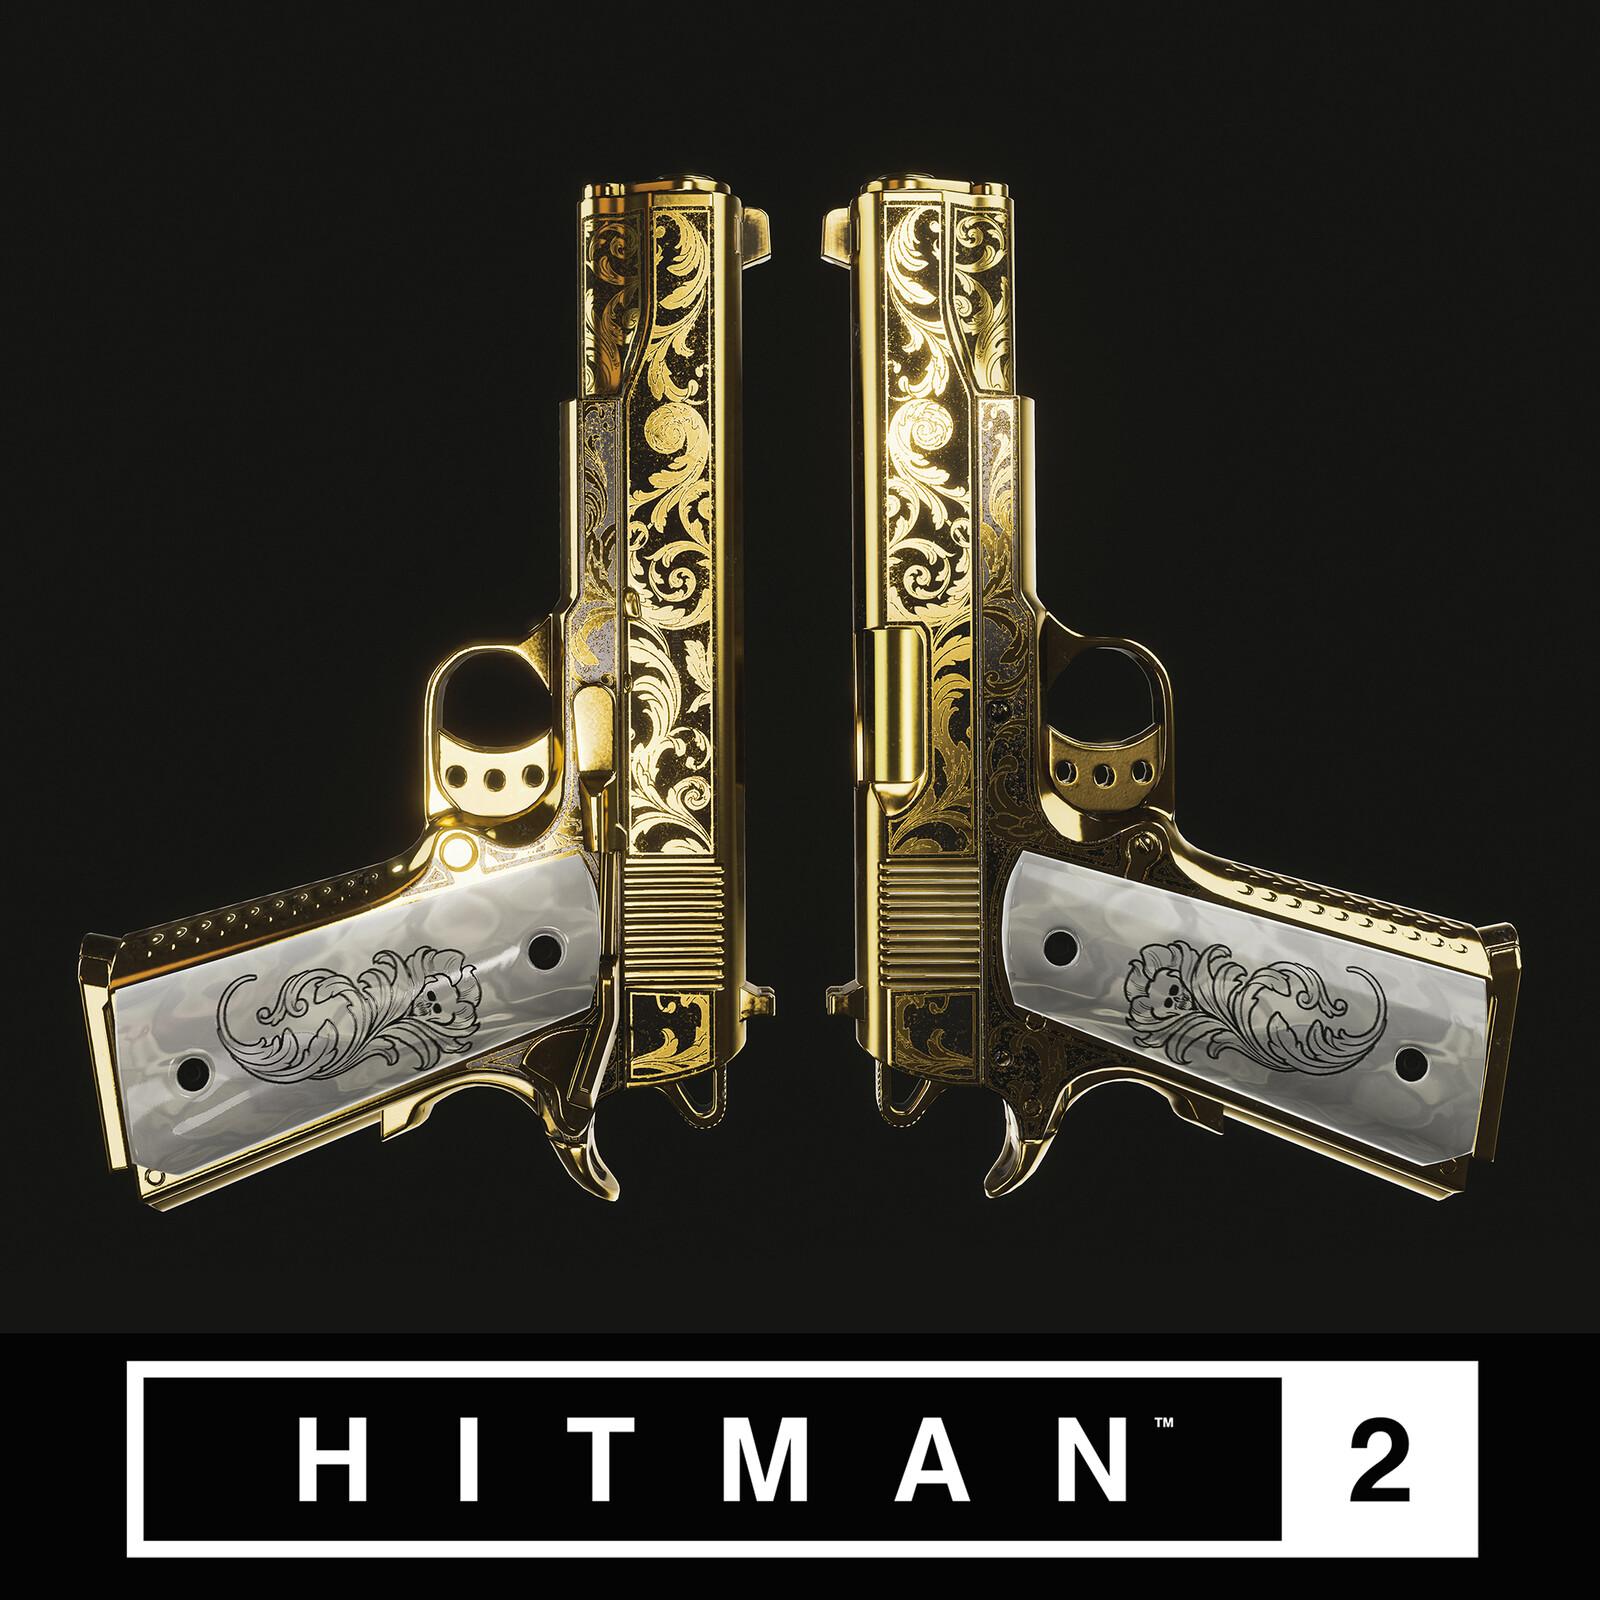 Hitman 2 - Various Props